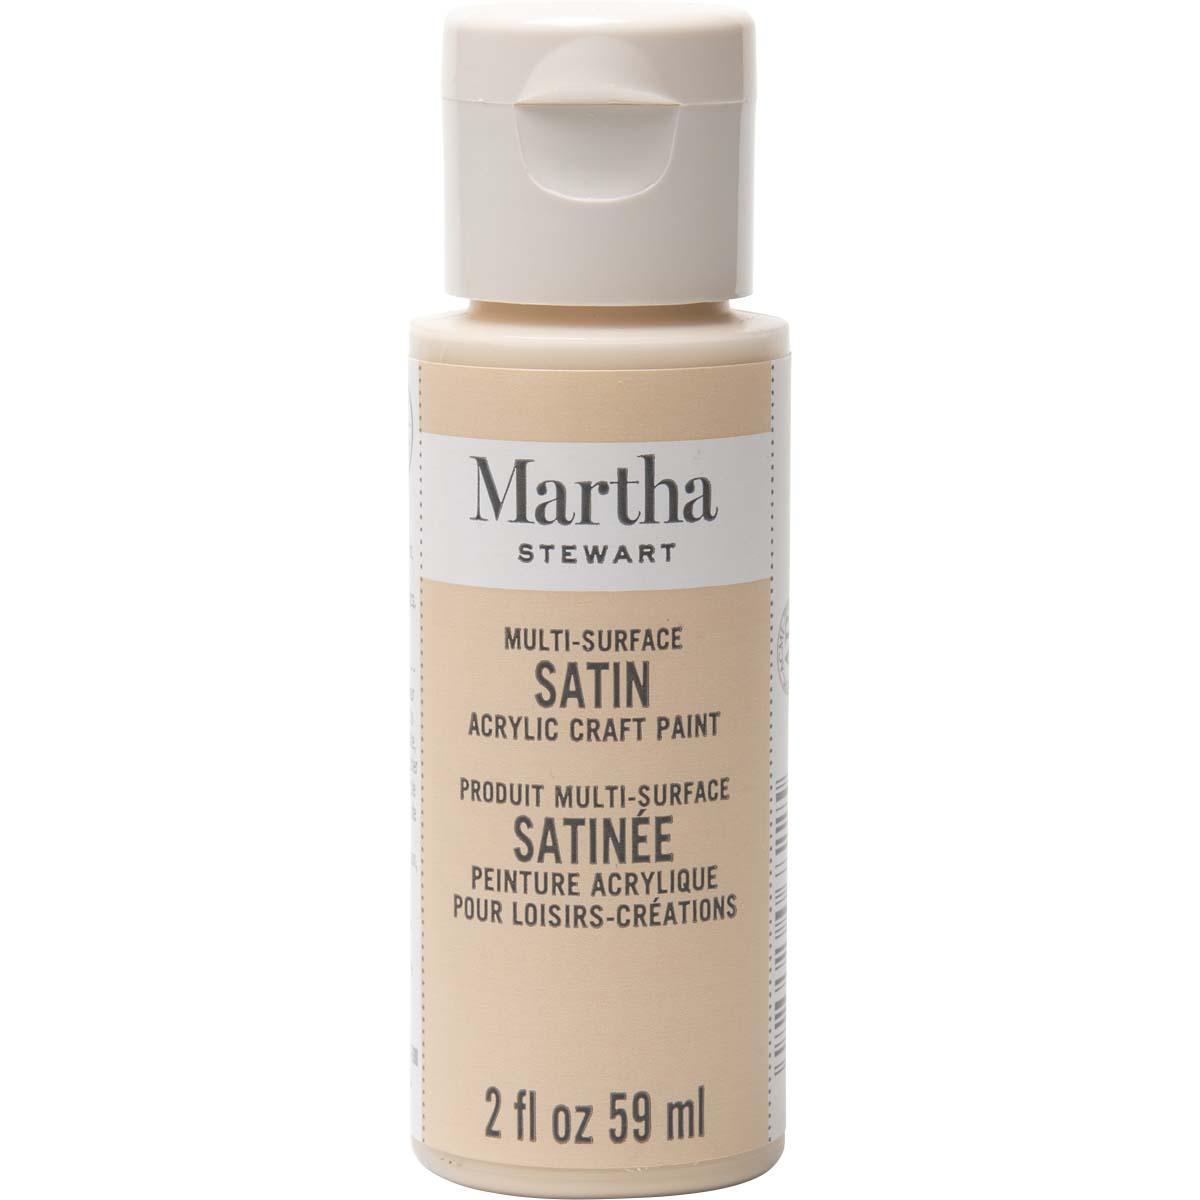 Martha Stewart® 2oz Multi-Surface Satin Acrylic Craft Paint - Sandcastle